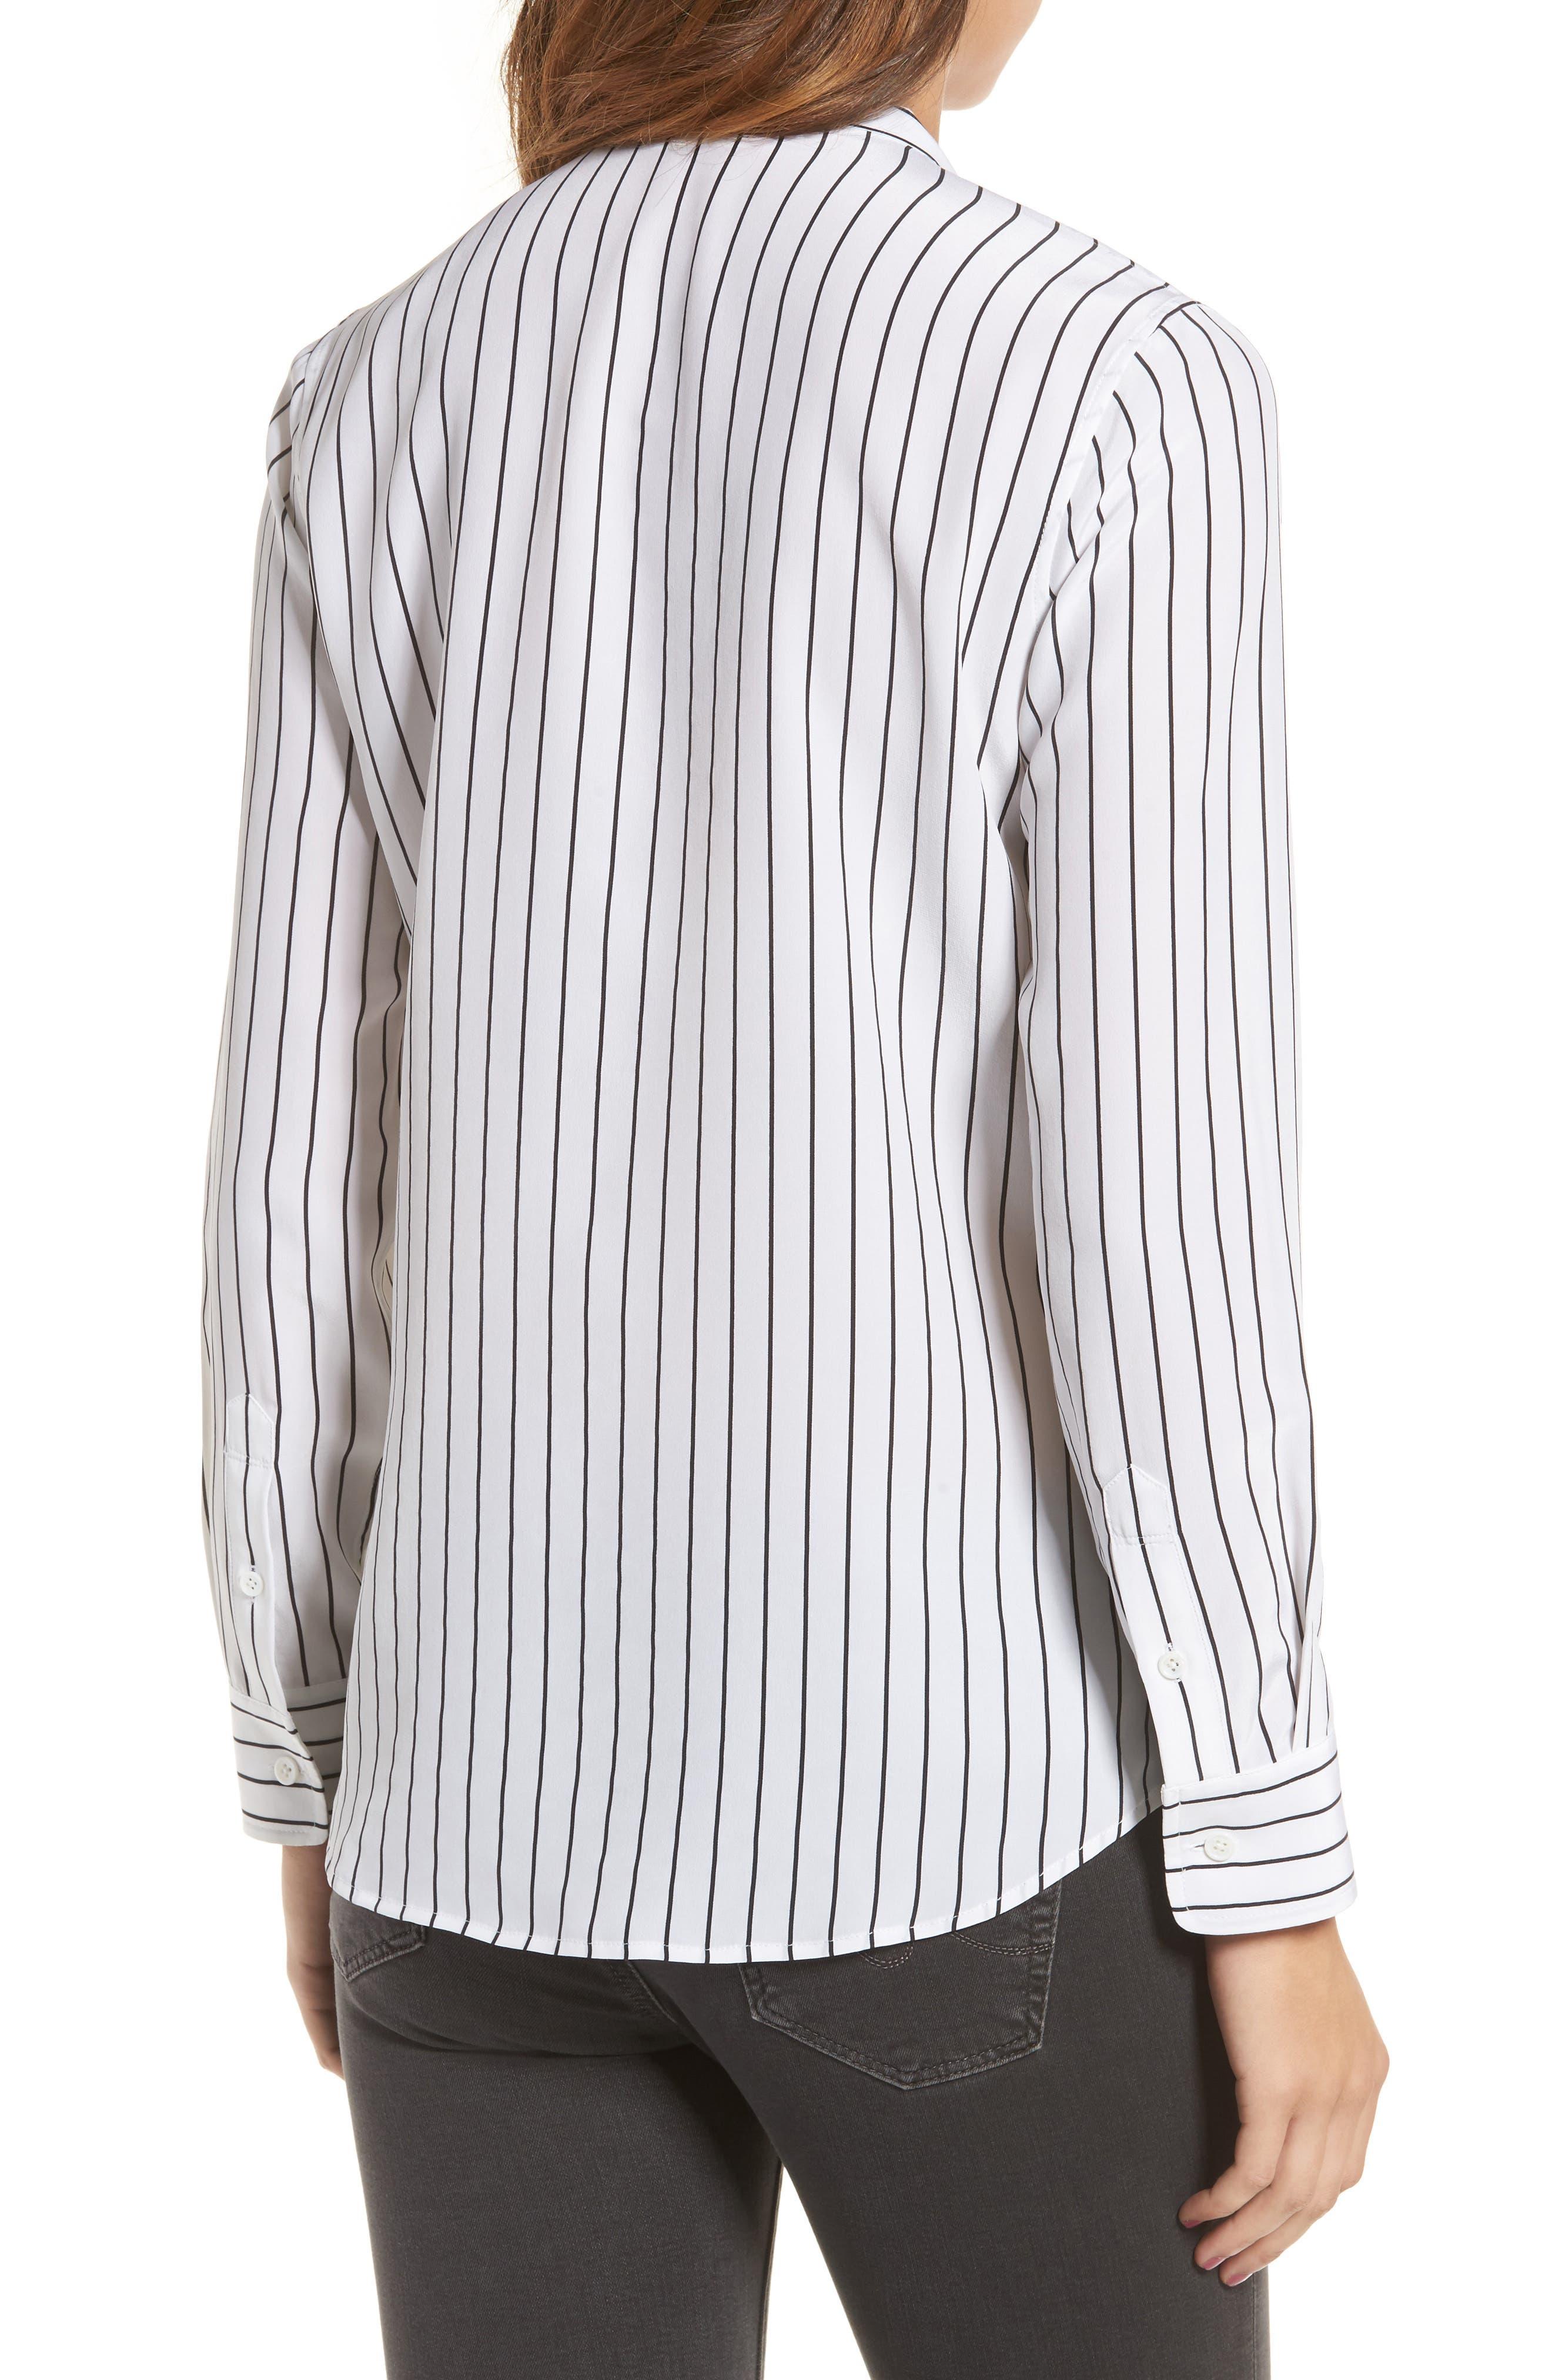 Claire Stripe Silk Shirt,                             Alternate thumbnail 2, color,                             True White / True Black Stripe